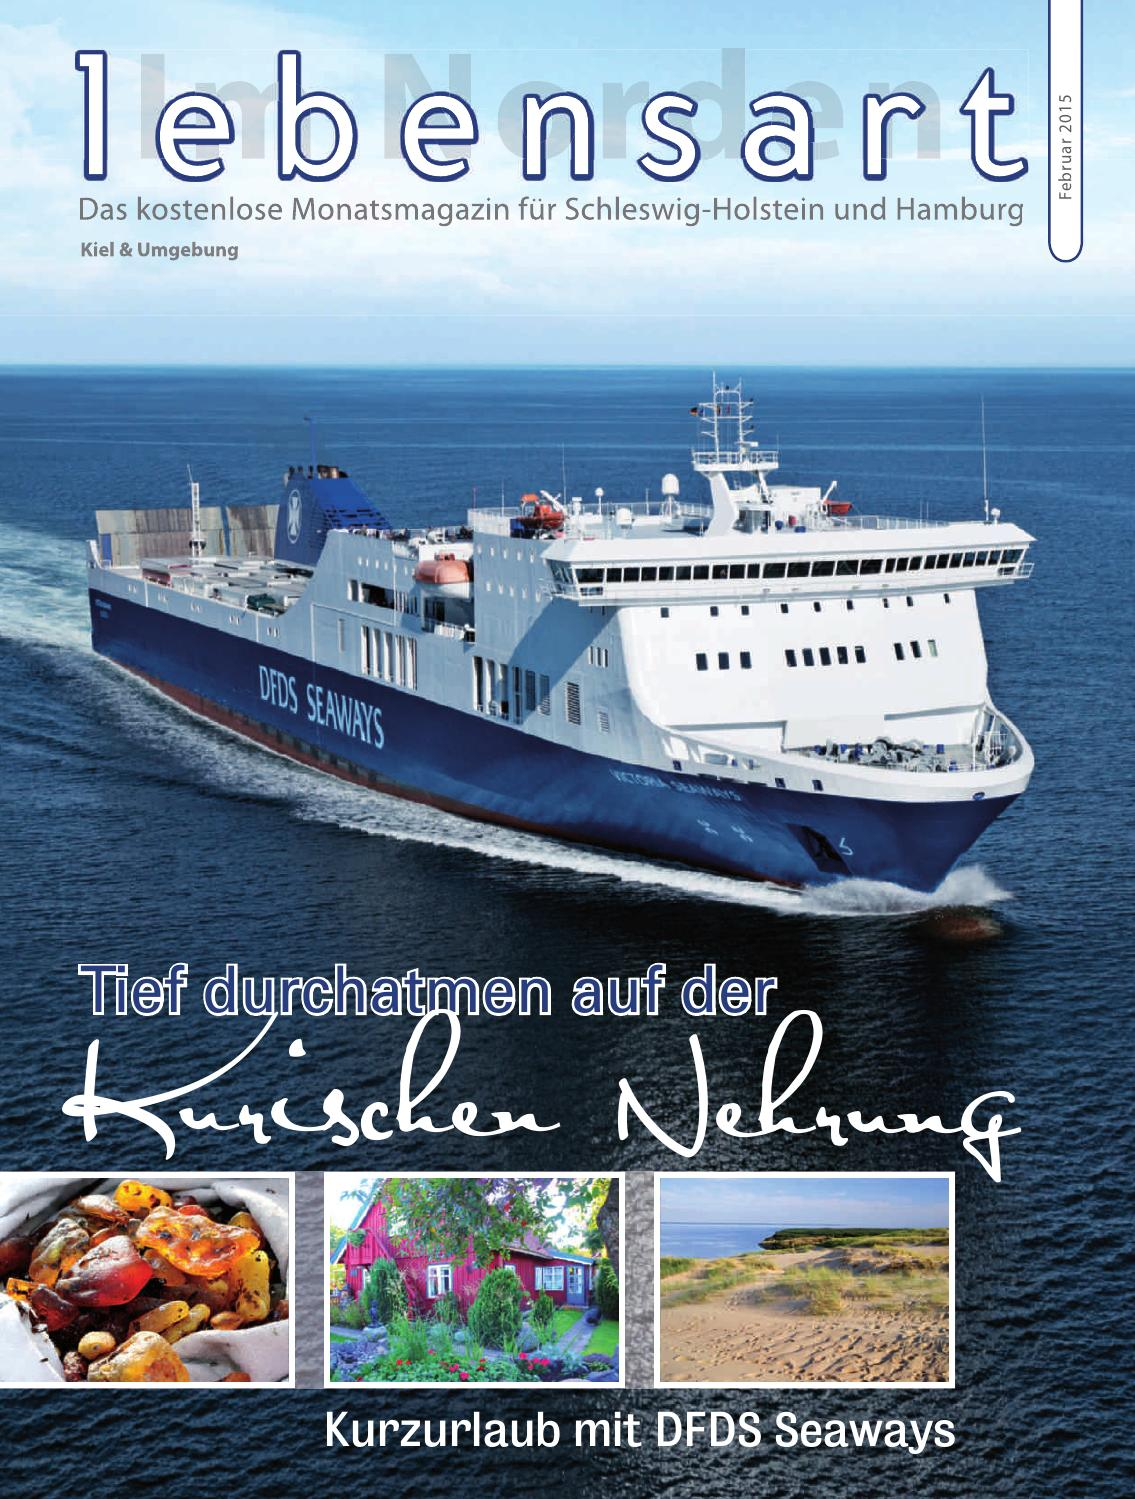 Lebensart Im Norden Kiel Februar 2015 By Verlagskontor Schleswig